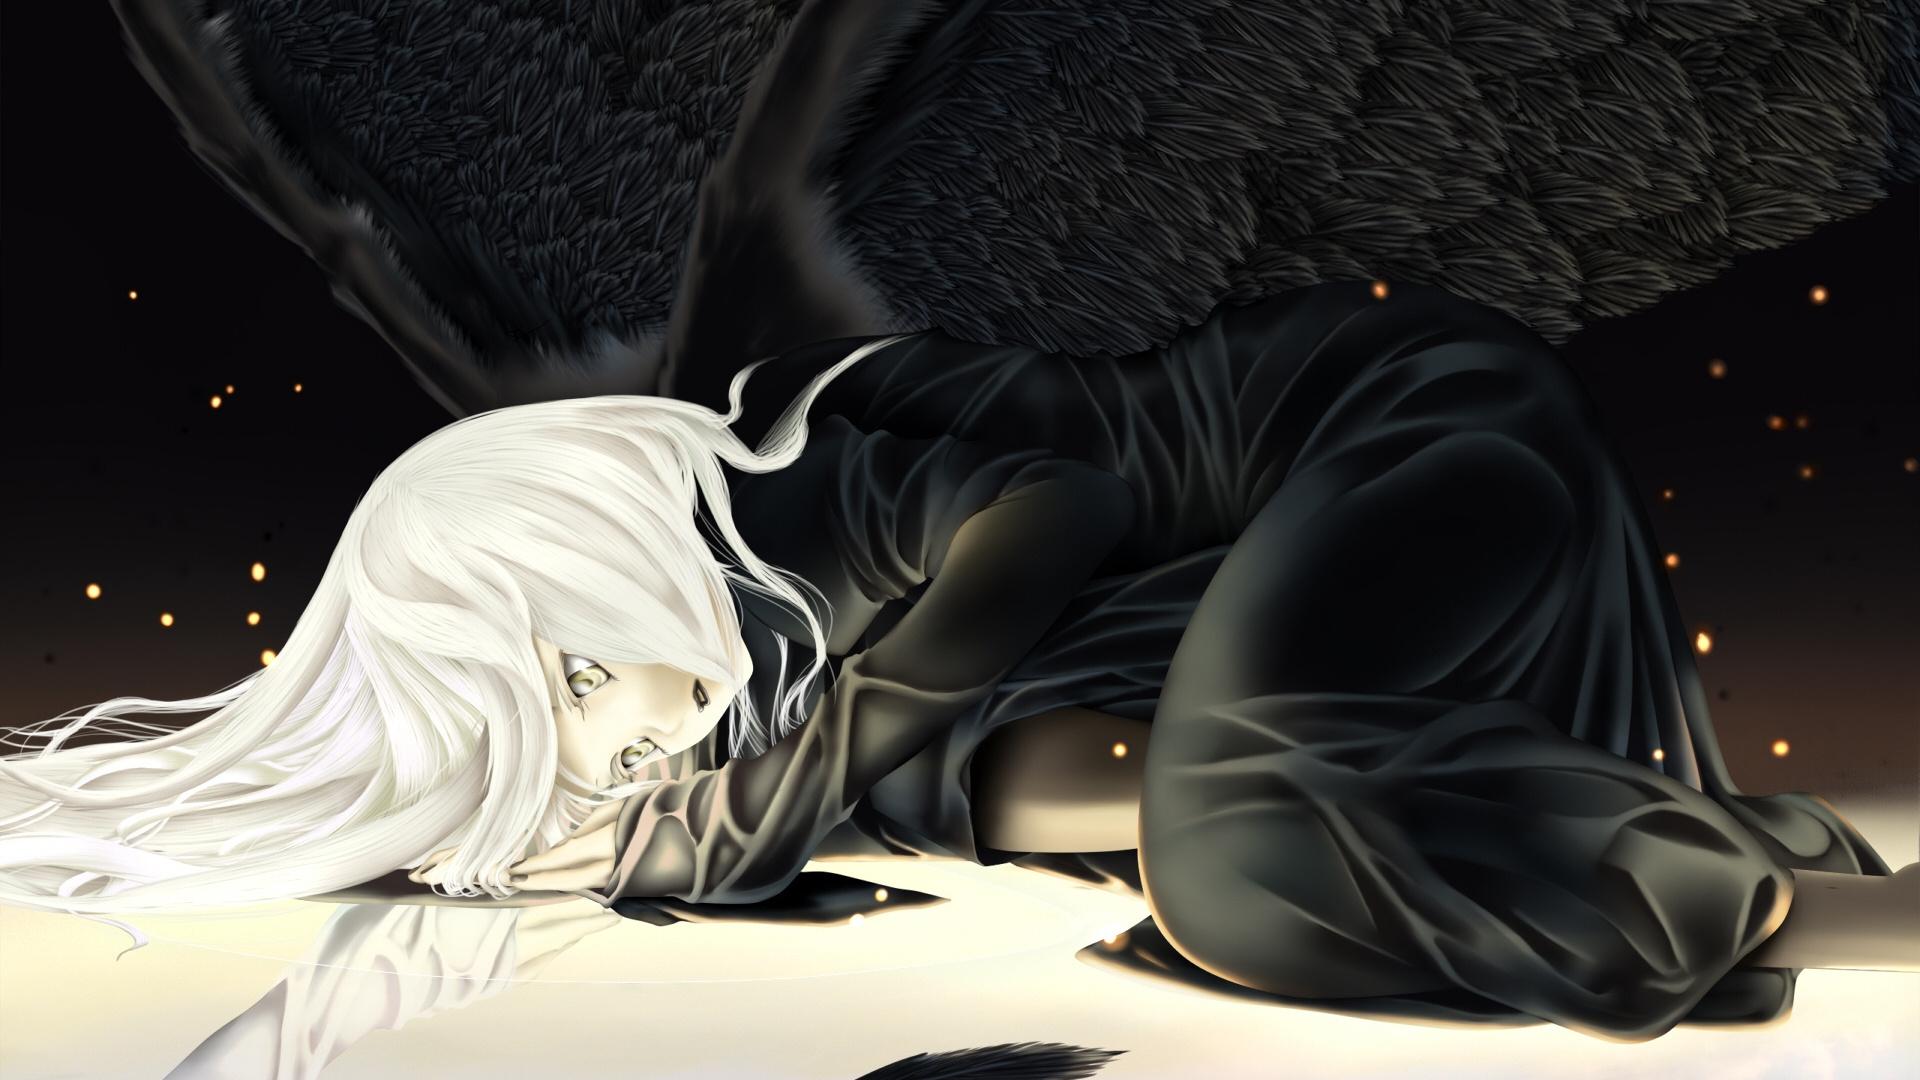 Wallpaper anime girl blond wing sadness darkness - Dark angel anime wallpaper ...